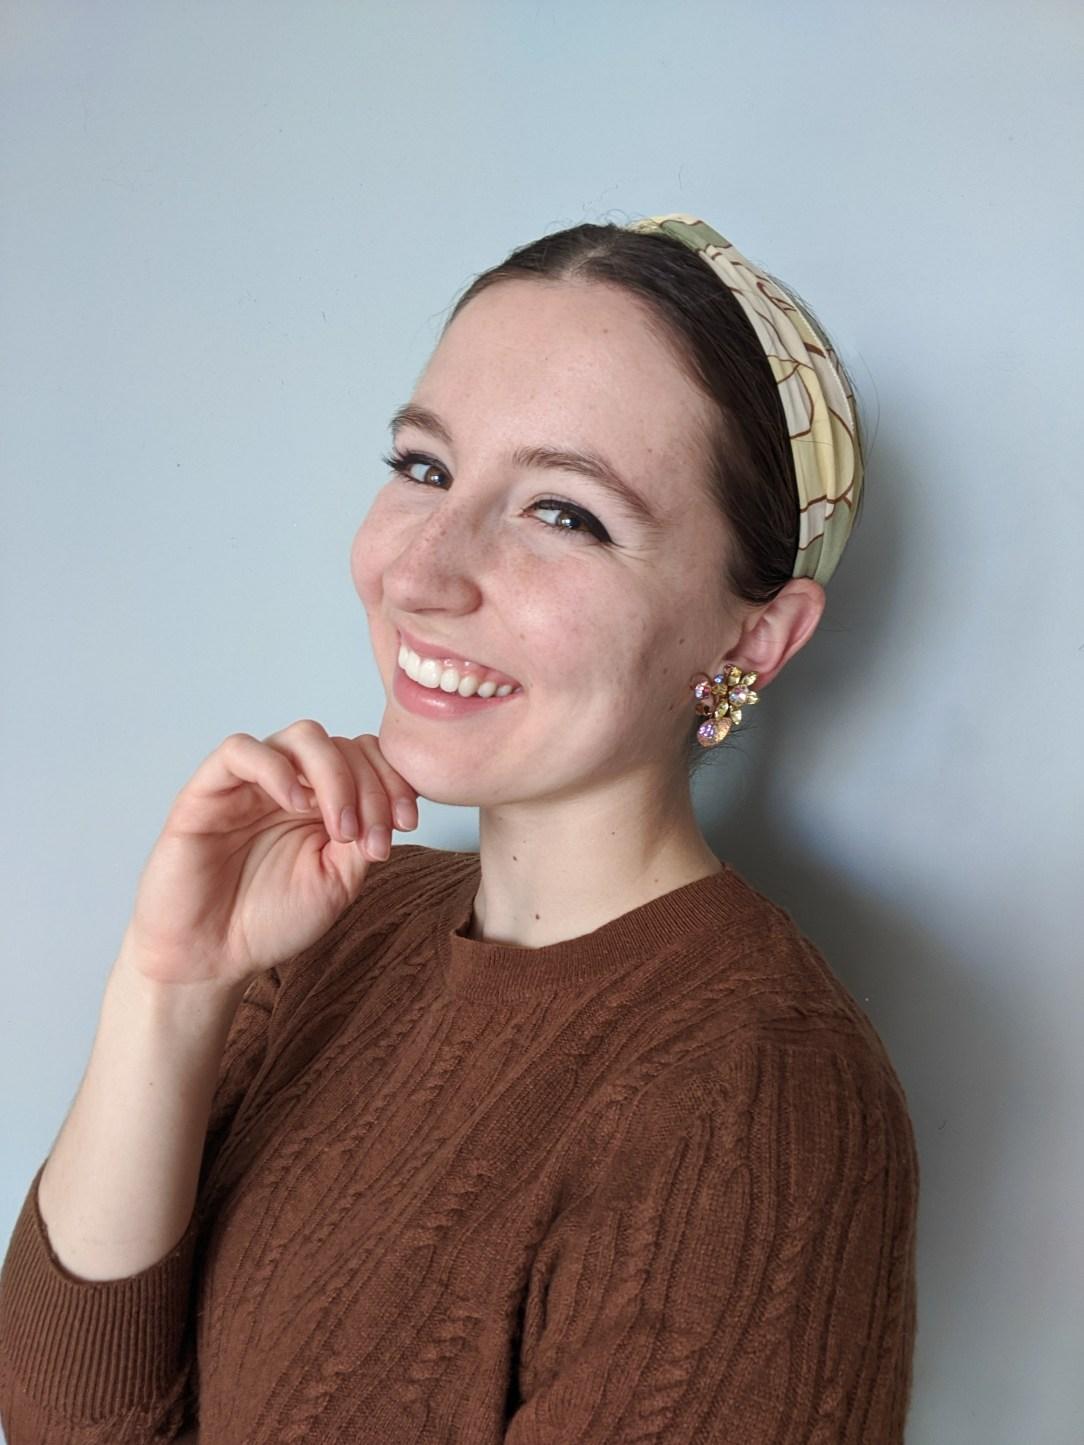 green hair scarf, brown sweater, statement earrings, winged eyeliner